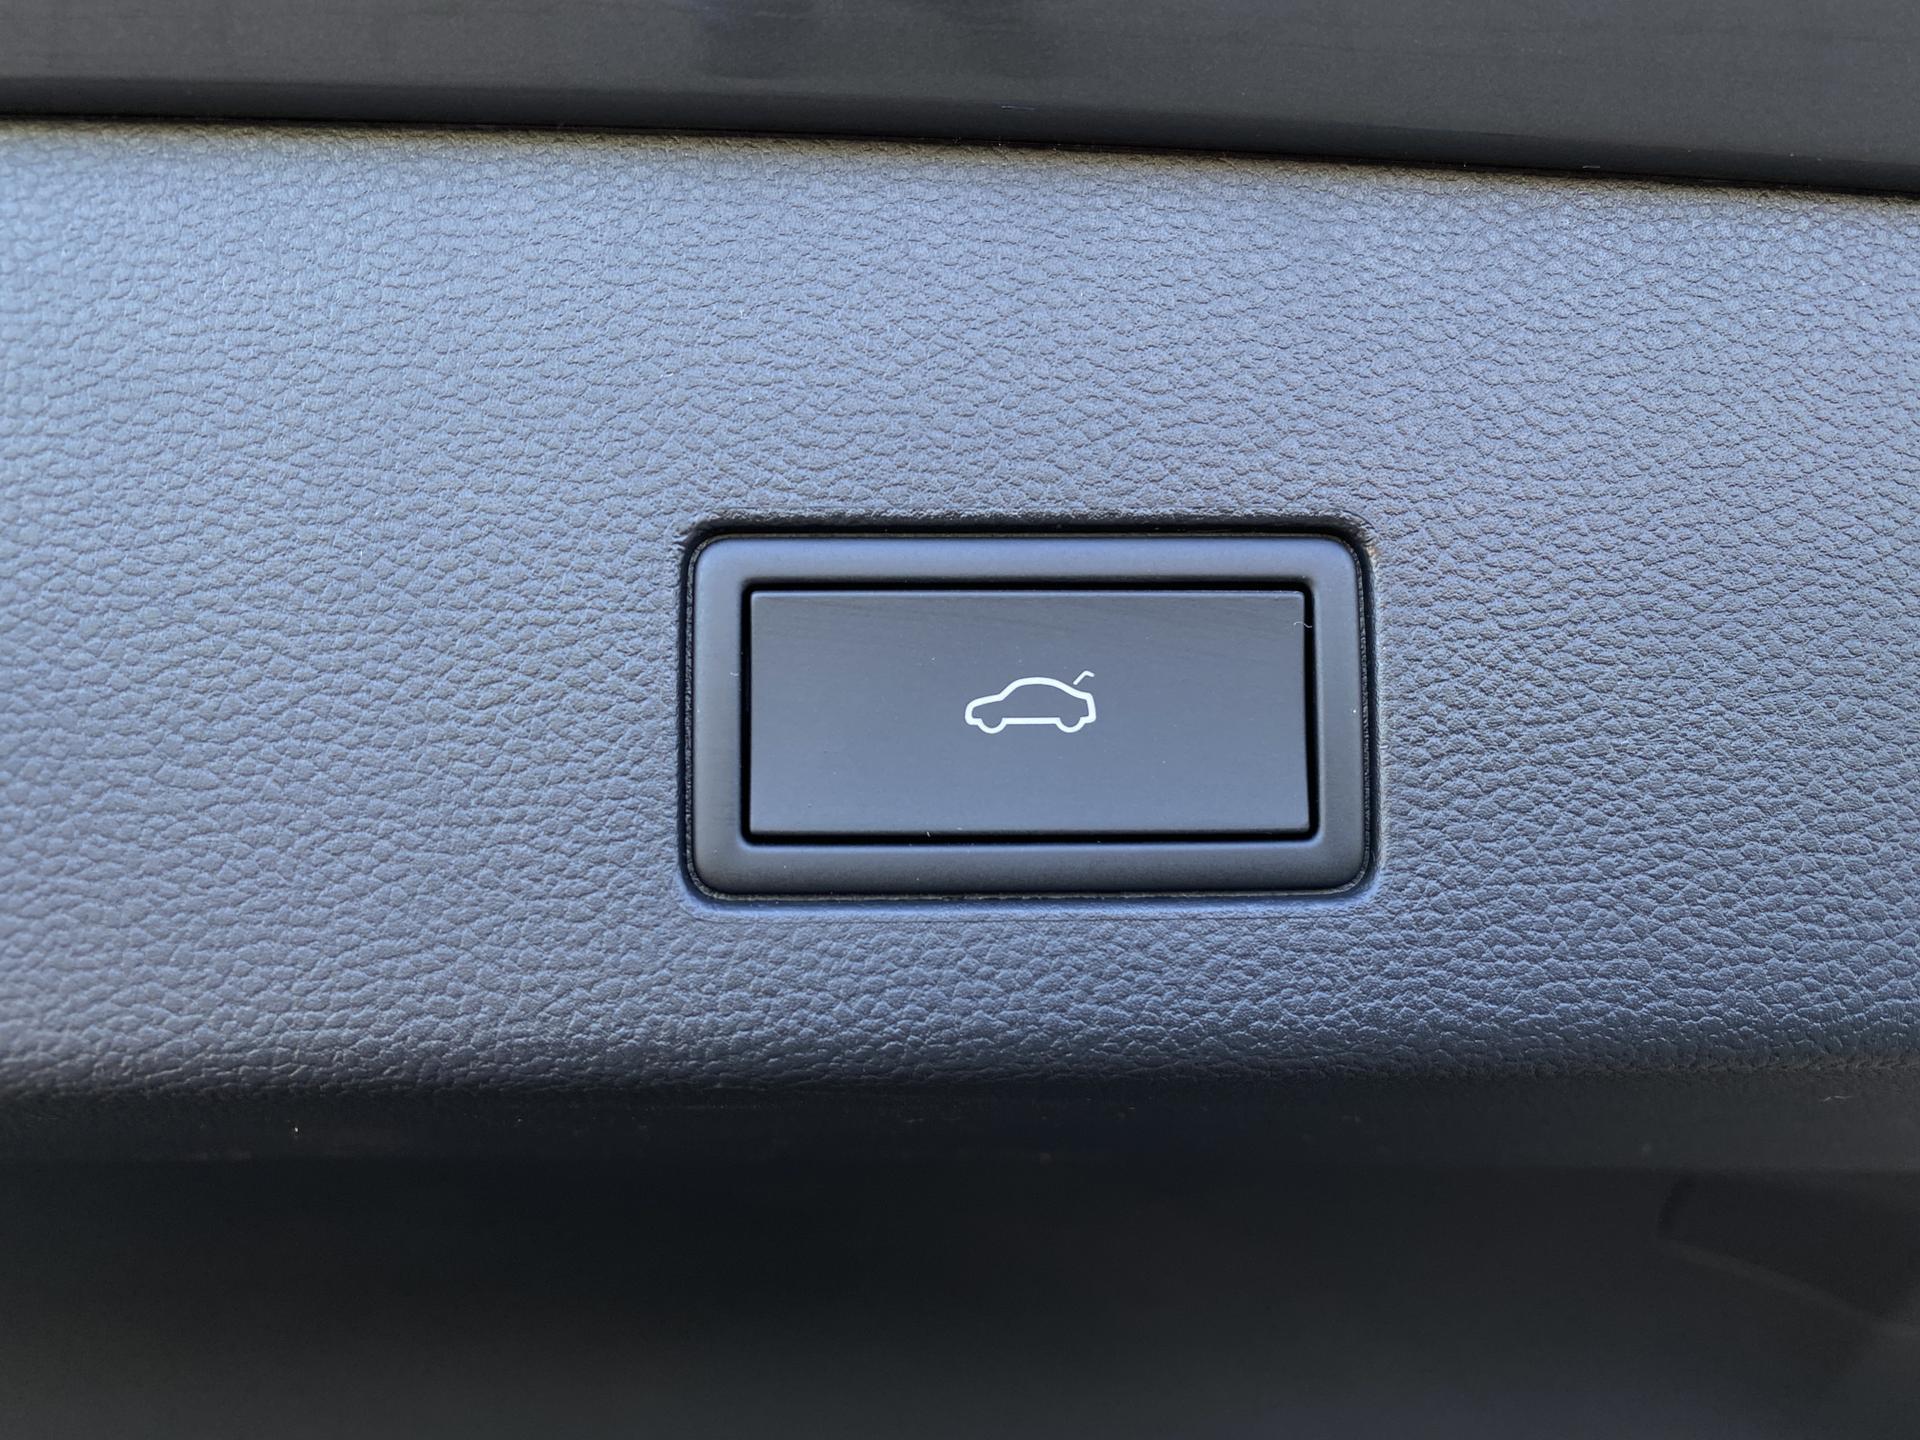 VW Golf Variant Kofferraumtaste